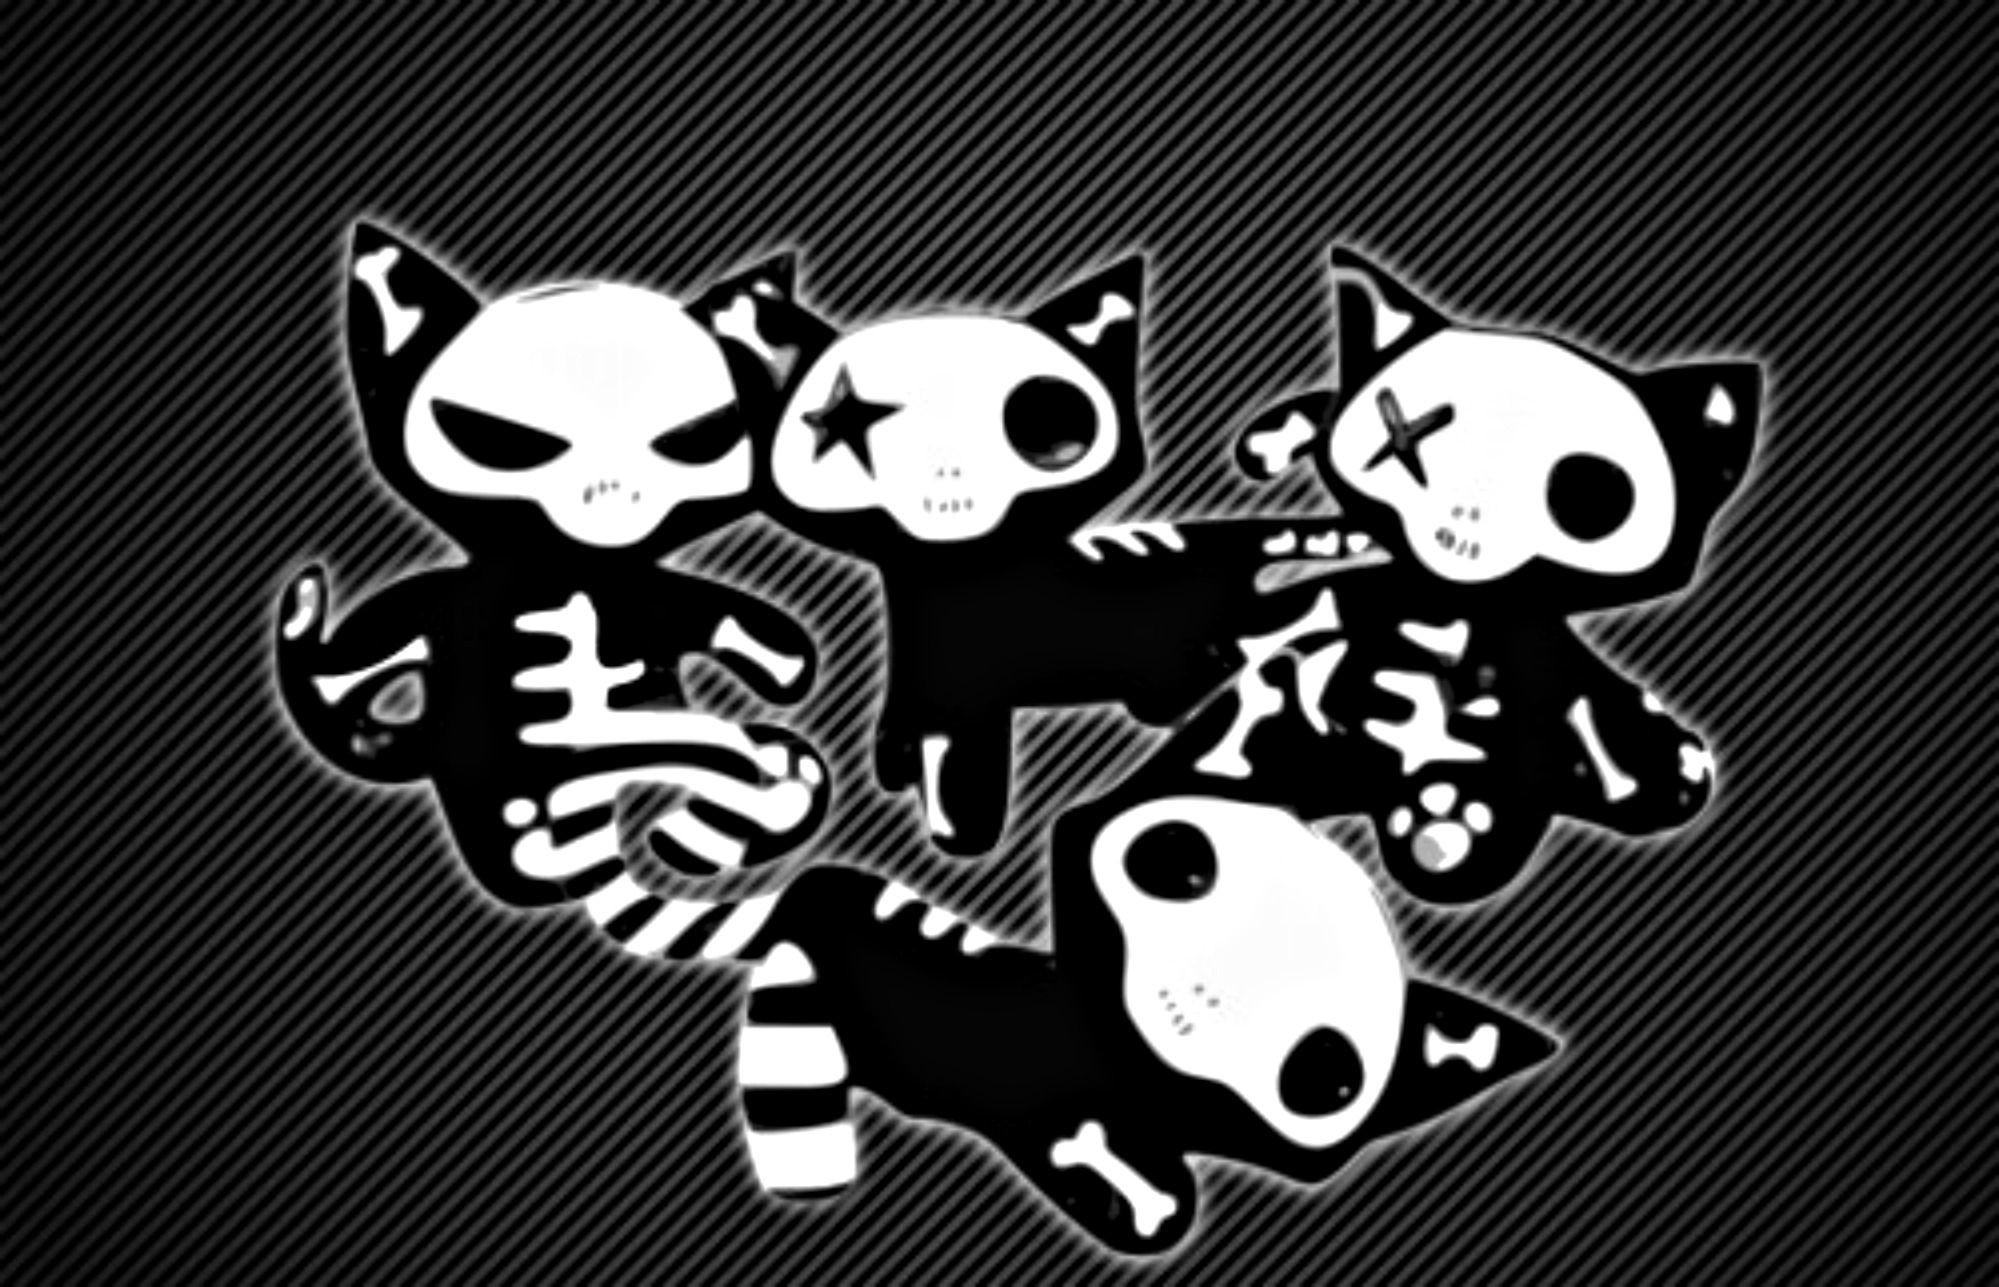 3733x2100 Alienware Skull Candy Headphones Girl Wallpaper By NovaDarkMadness